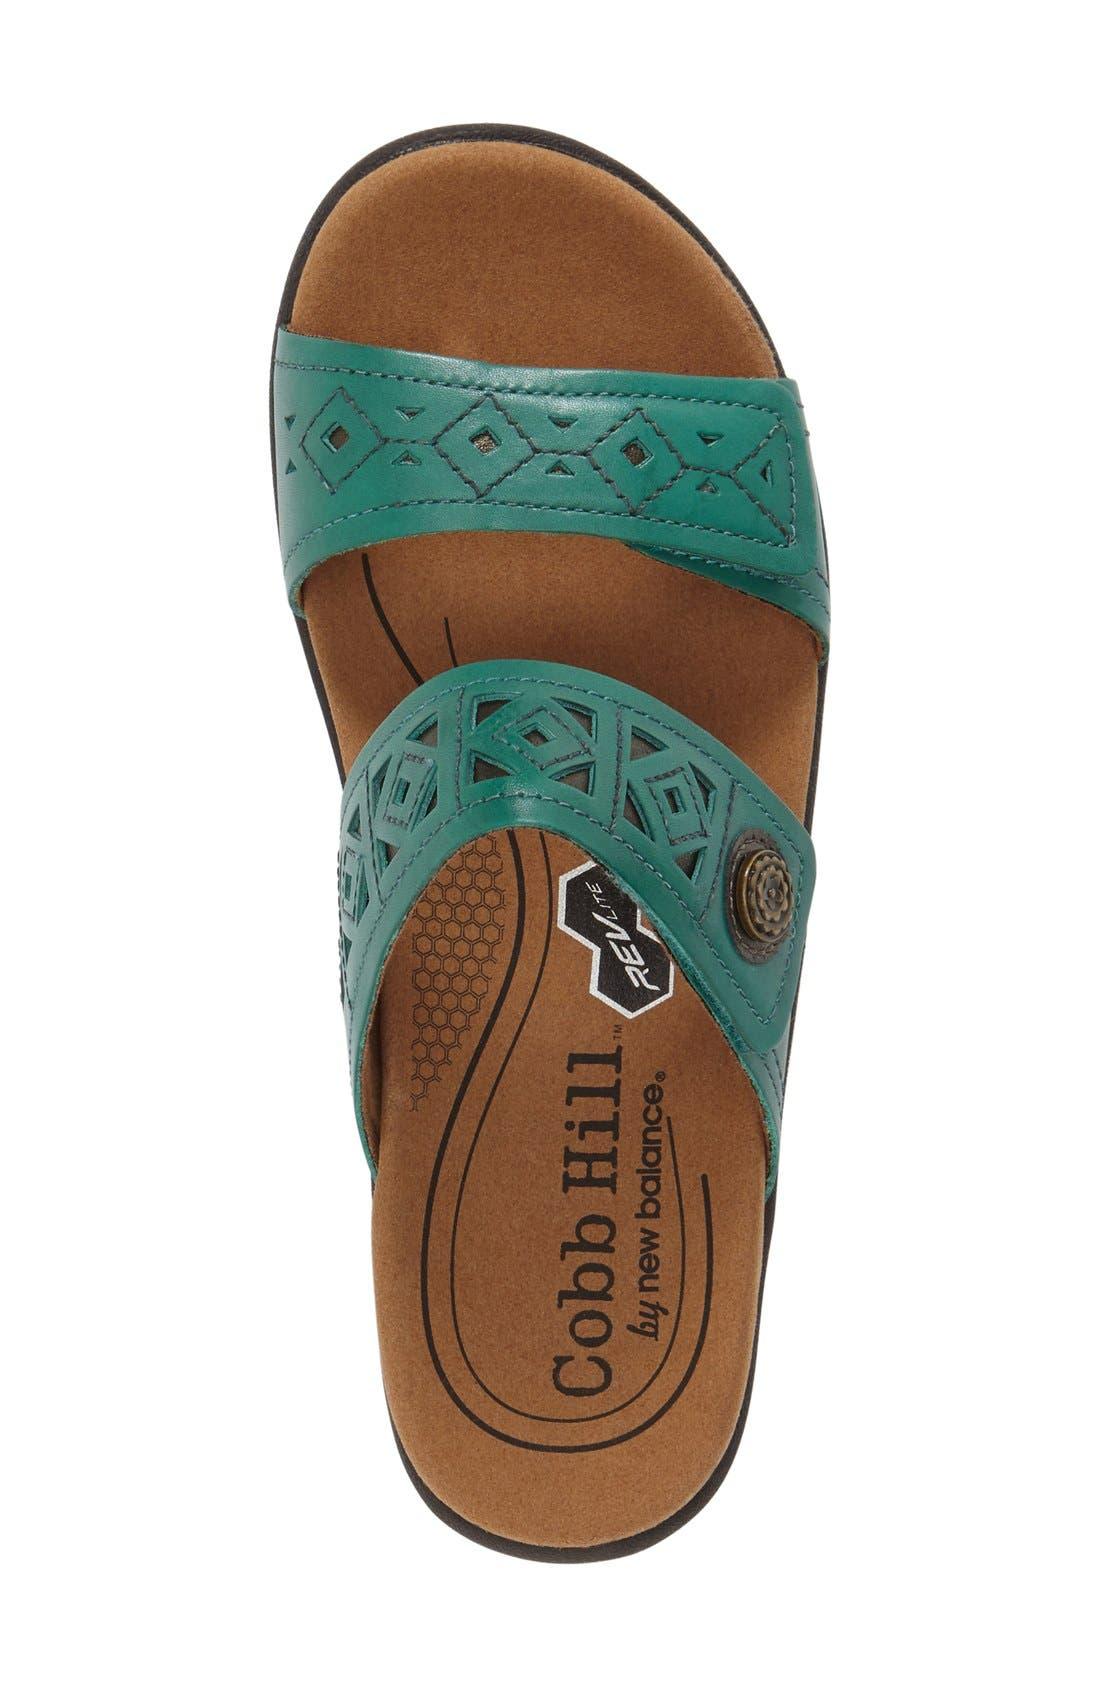 Alternate Image 3  - Rockport Cobb Hill REVsoul Two Strap Sandal (Women)